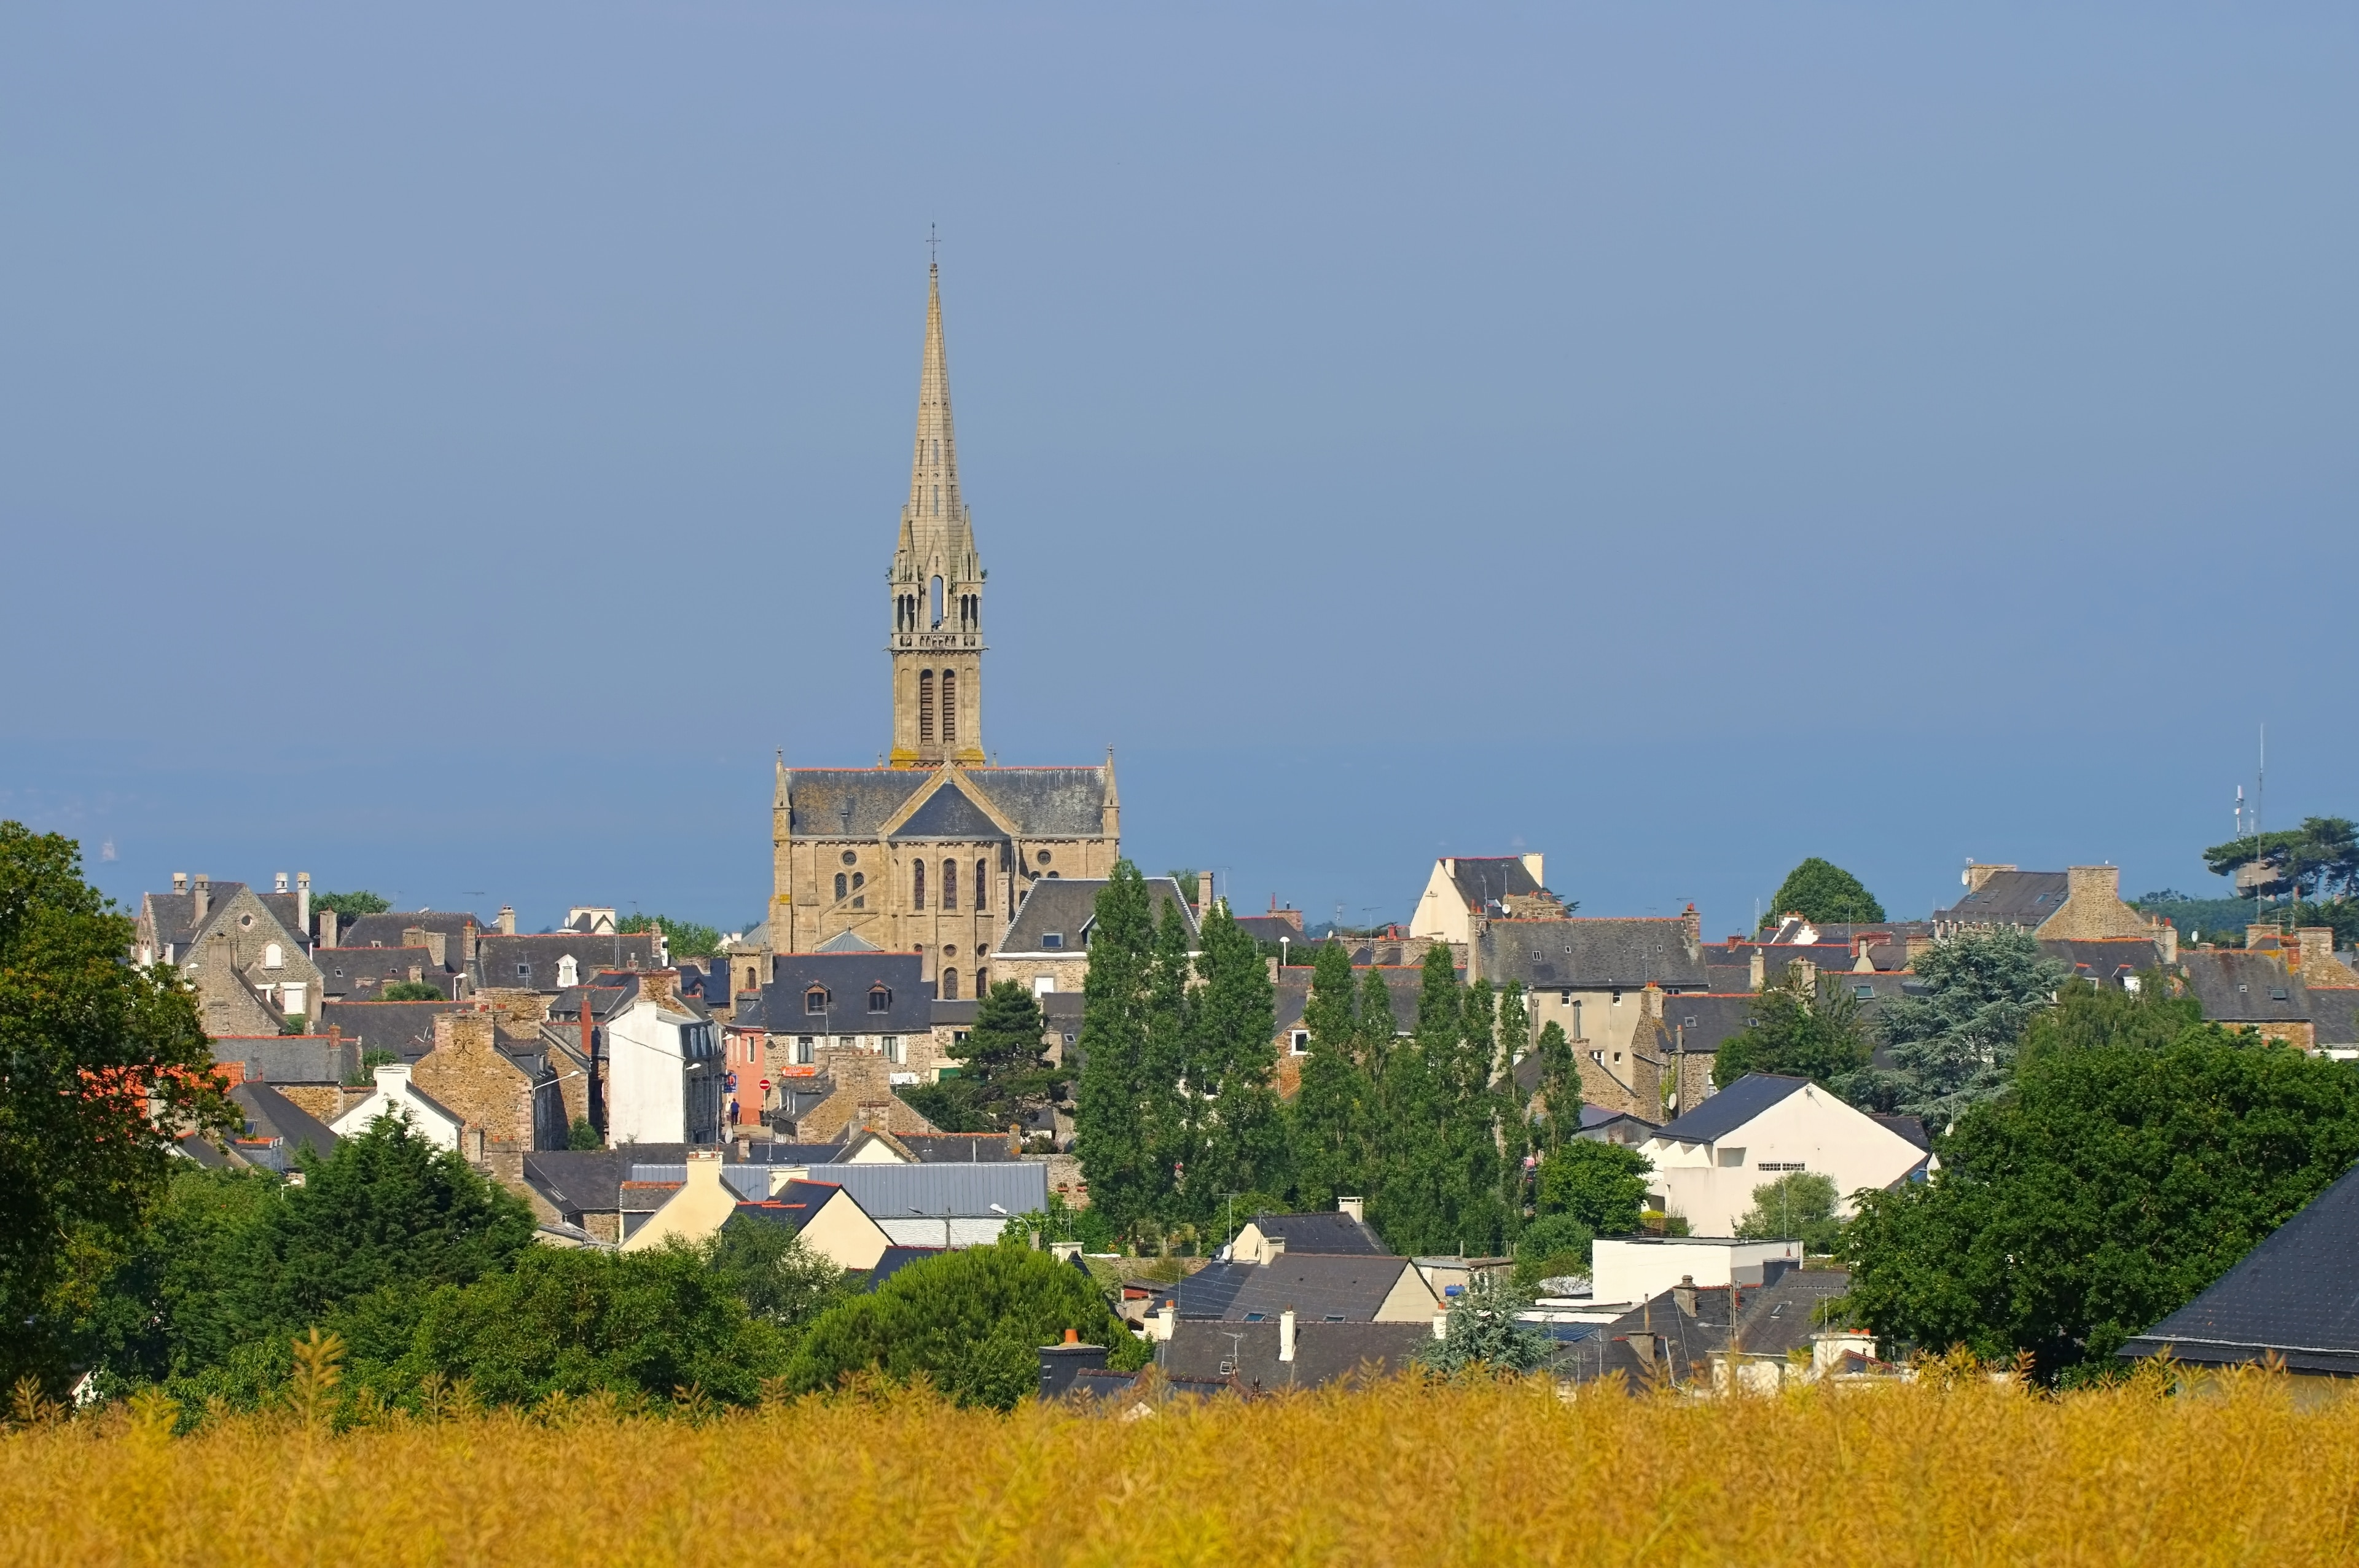 Pleneuf-Val-Andre, Cotes d'Armor, France